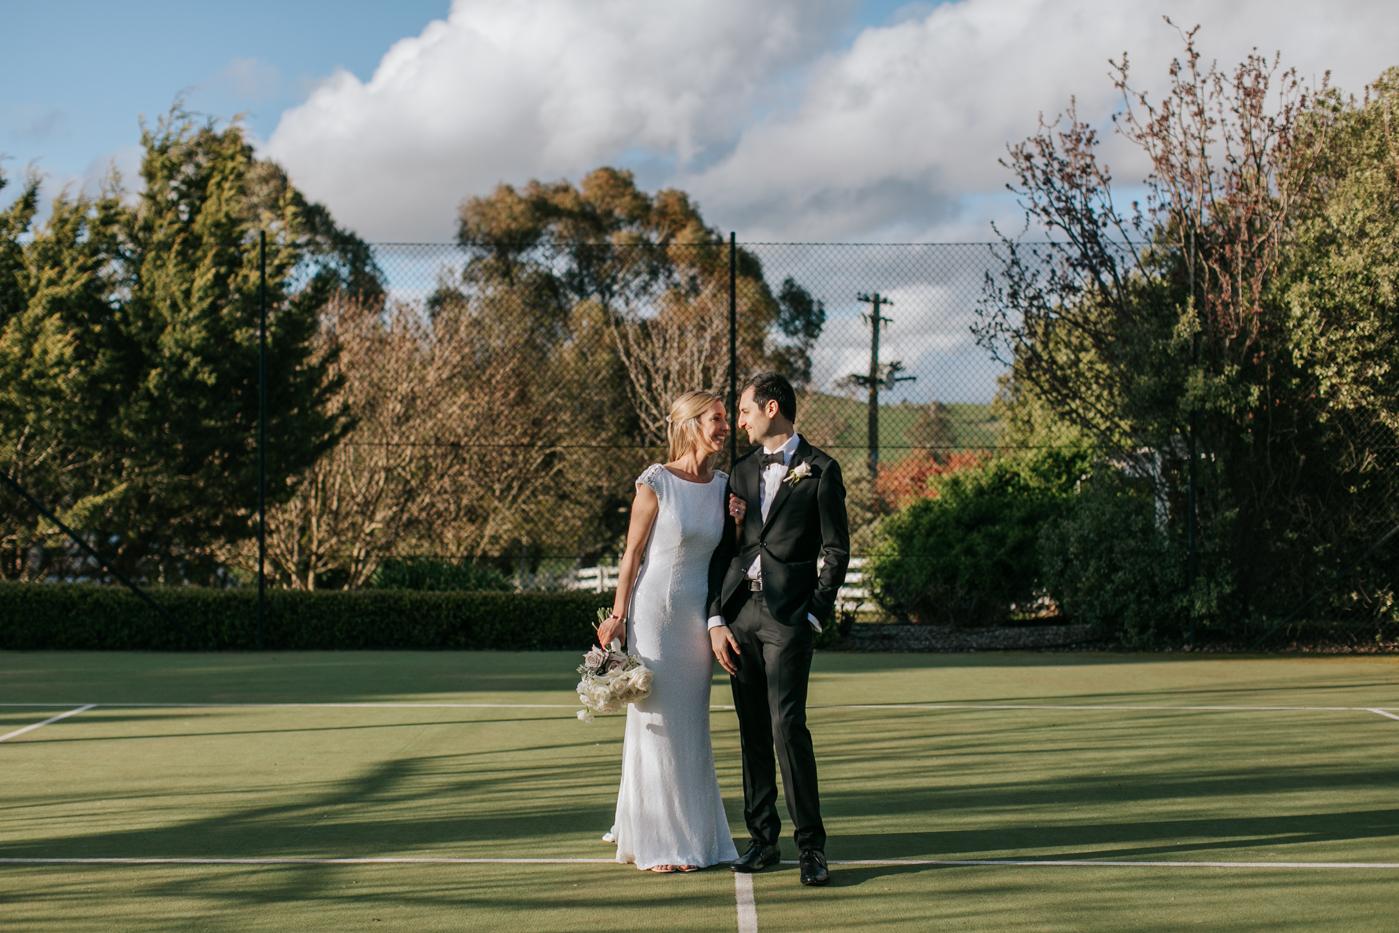 Bridget & James - Orange Country Wedding - Samantha Heather Photography-129.jpg